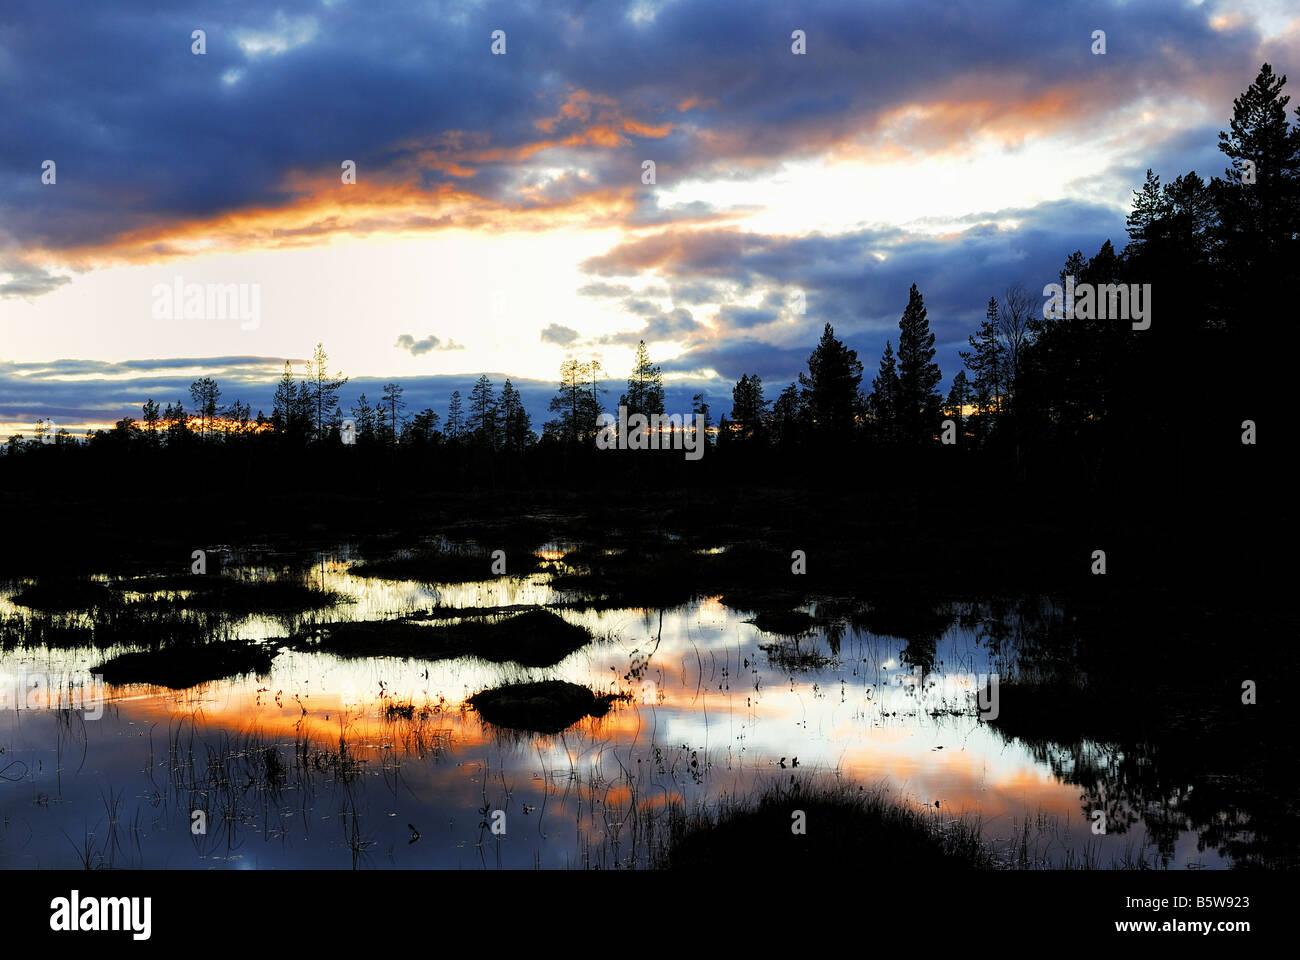 Evening mood in a swamp in Gällivare, Norrbotten, Lapland, Sweden, Scandinavia, Europe, September 2007 - Stock Image